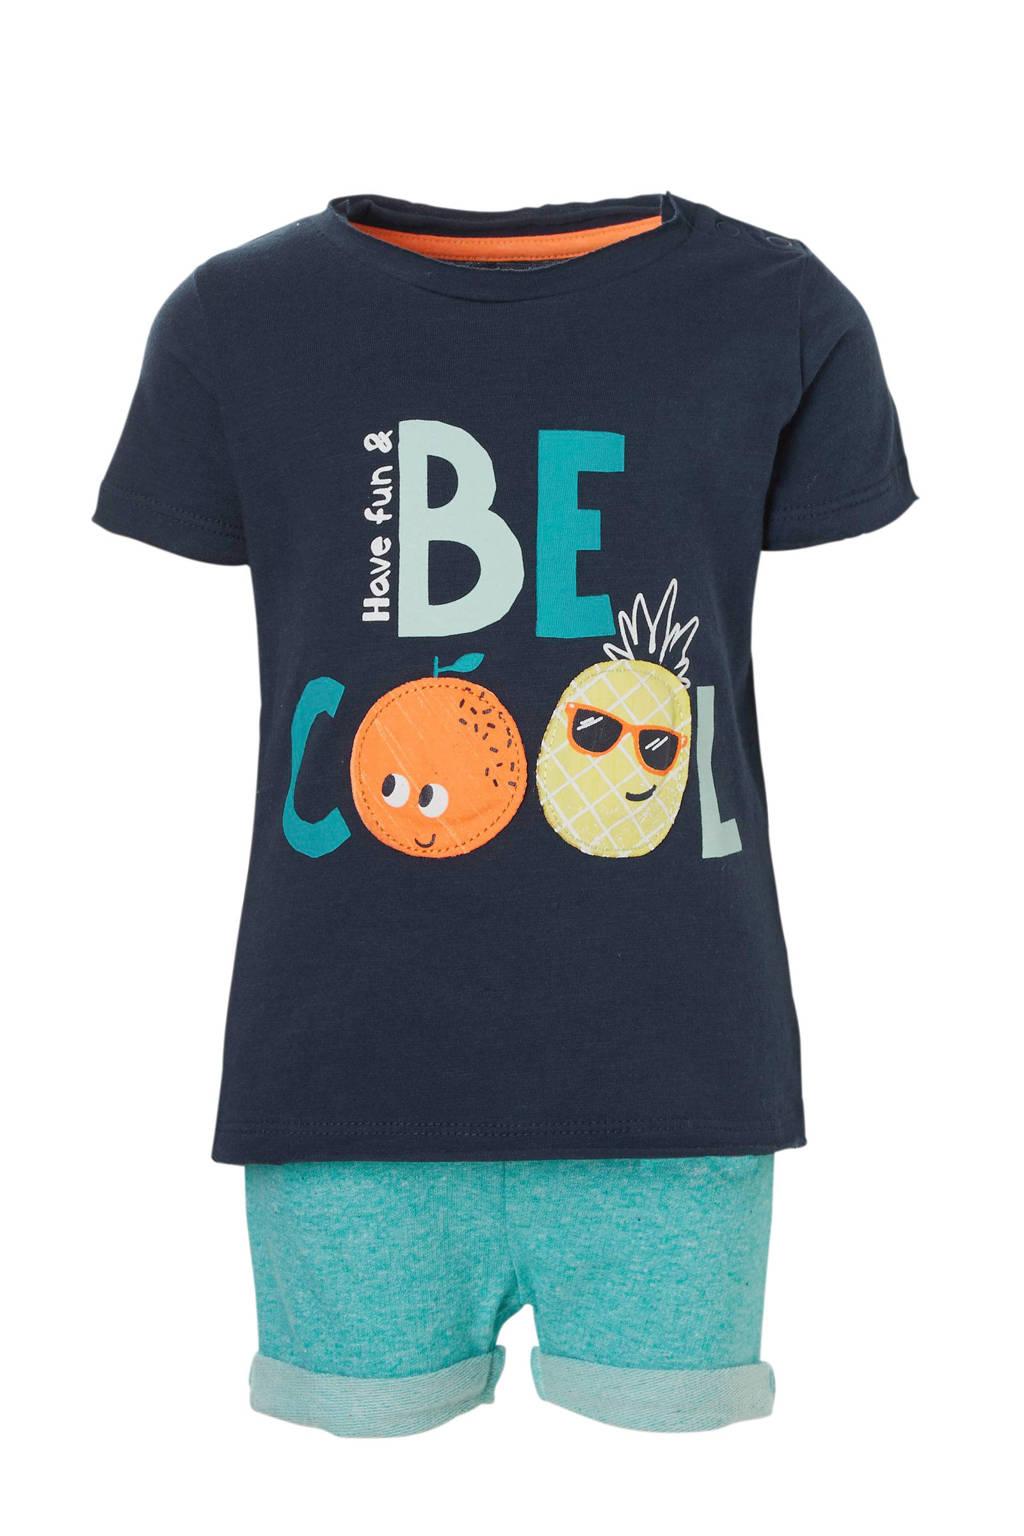 C&A Baby Club T-shirt + sweatshort, Donkerblauw/turquoise